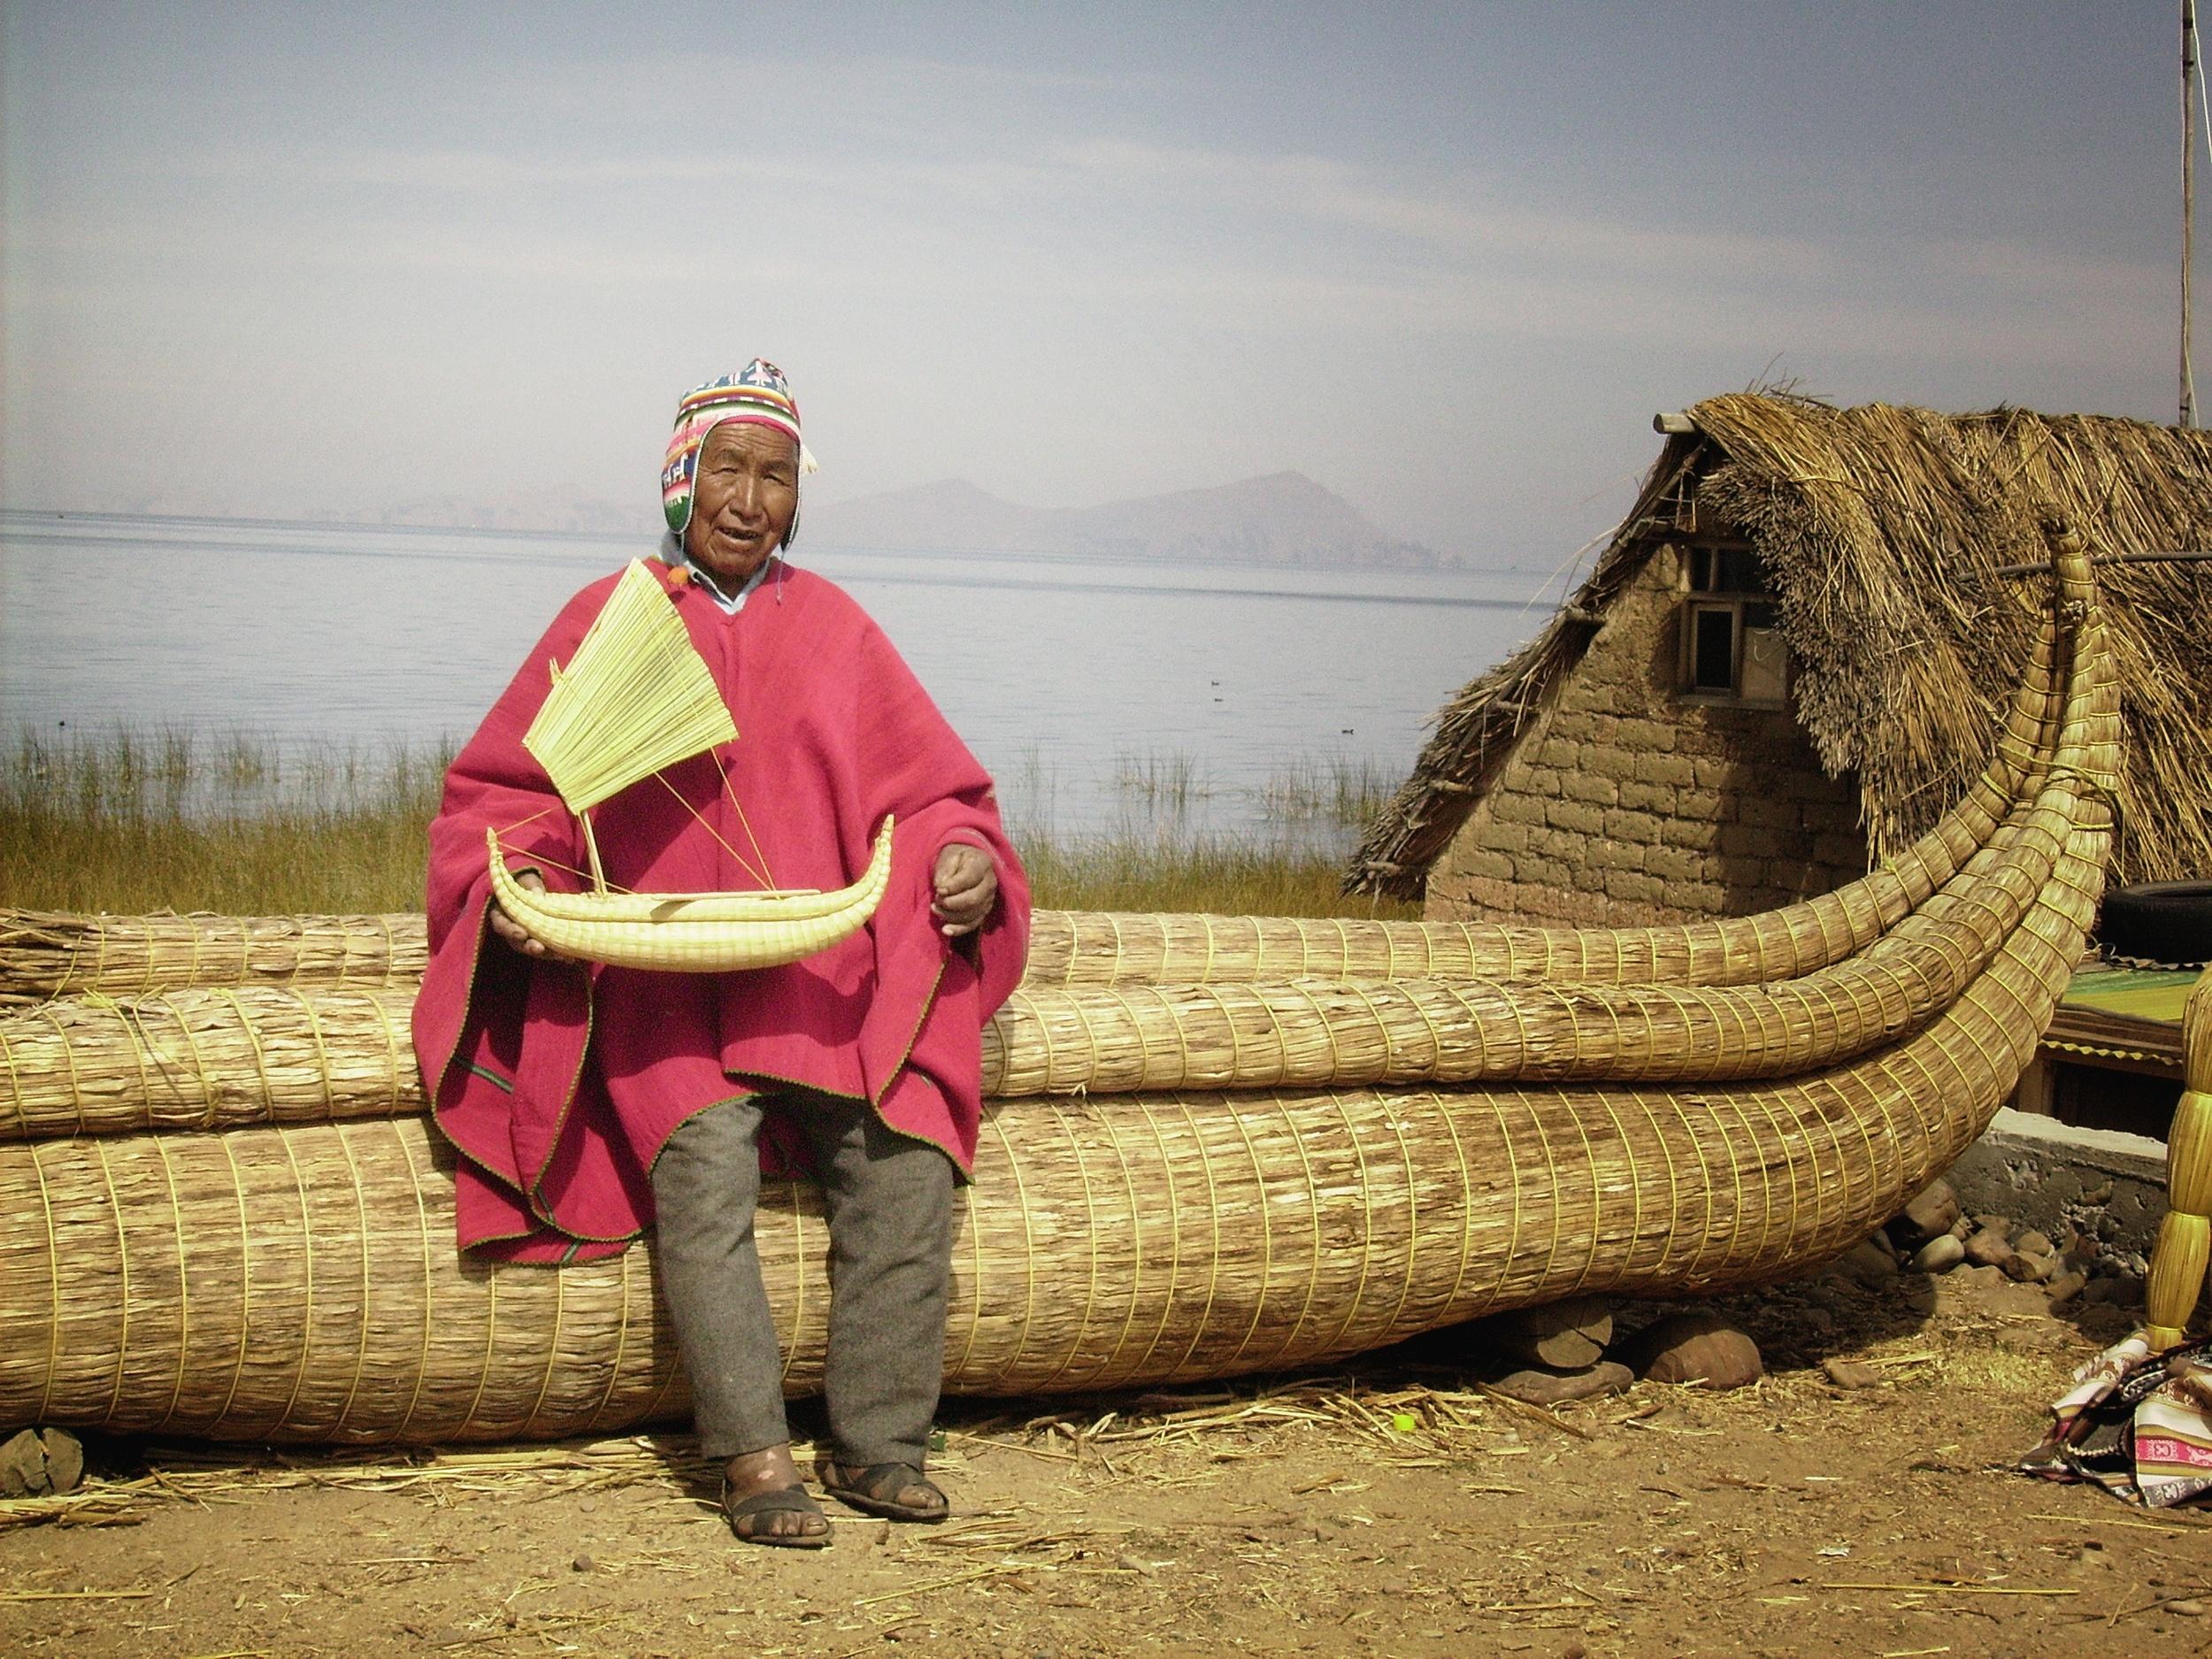 Reed boats, Lake Titicaca, Bolivia_Snapseed.jpg